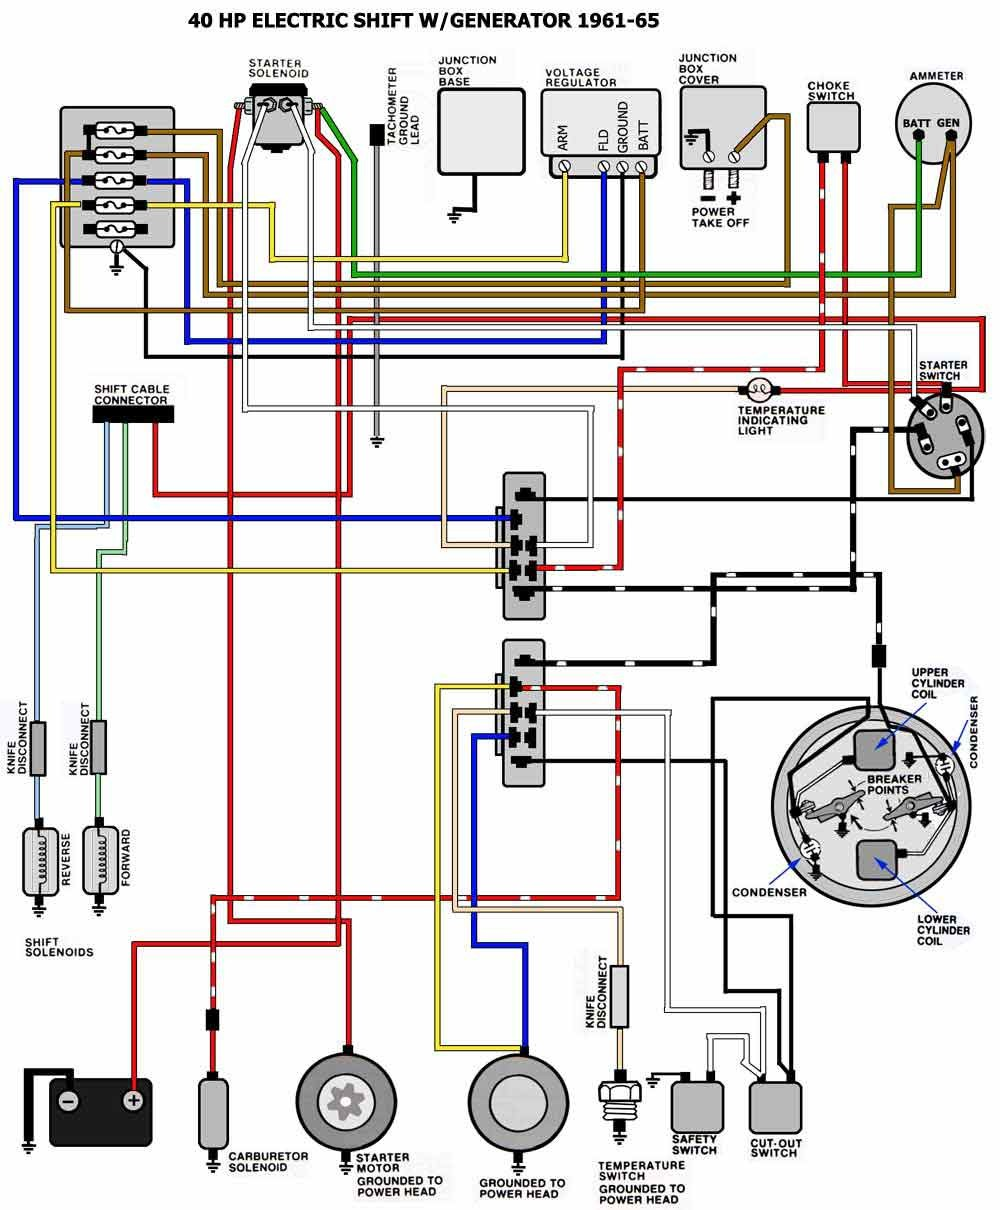 Mercury 40 Wiring Diagram Auto Electrical Wiring Diagram \u2022 Mercury  Smartcraft Gauges Mercury Force 40 Wiring Diagram